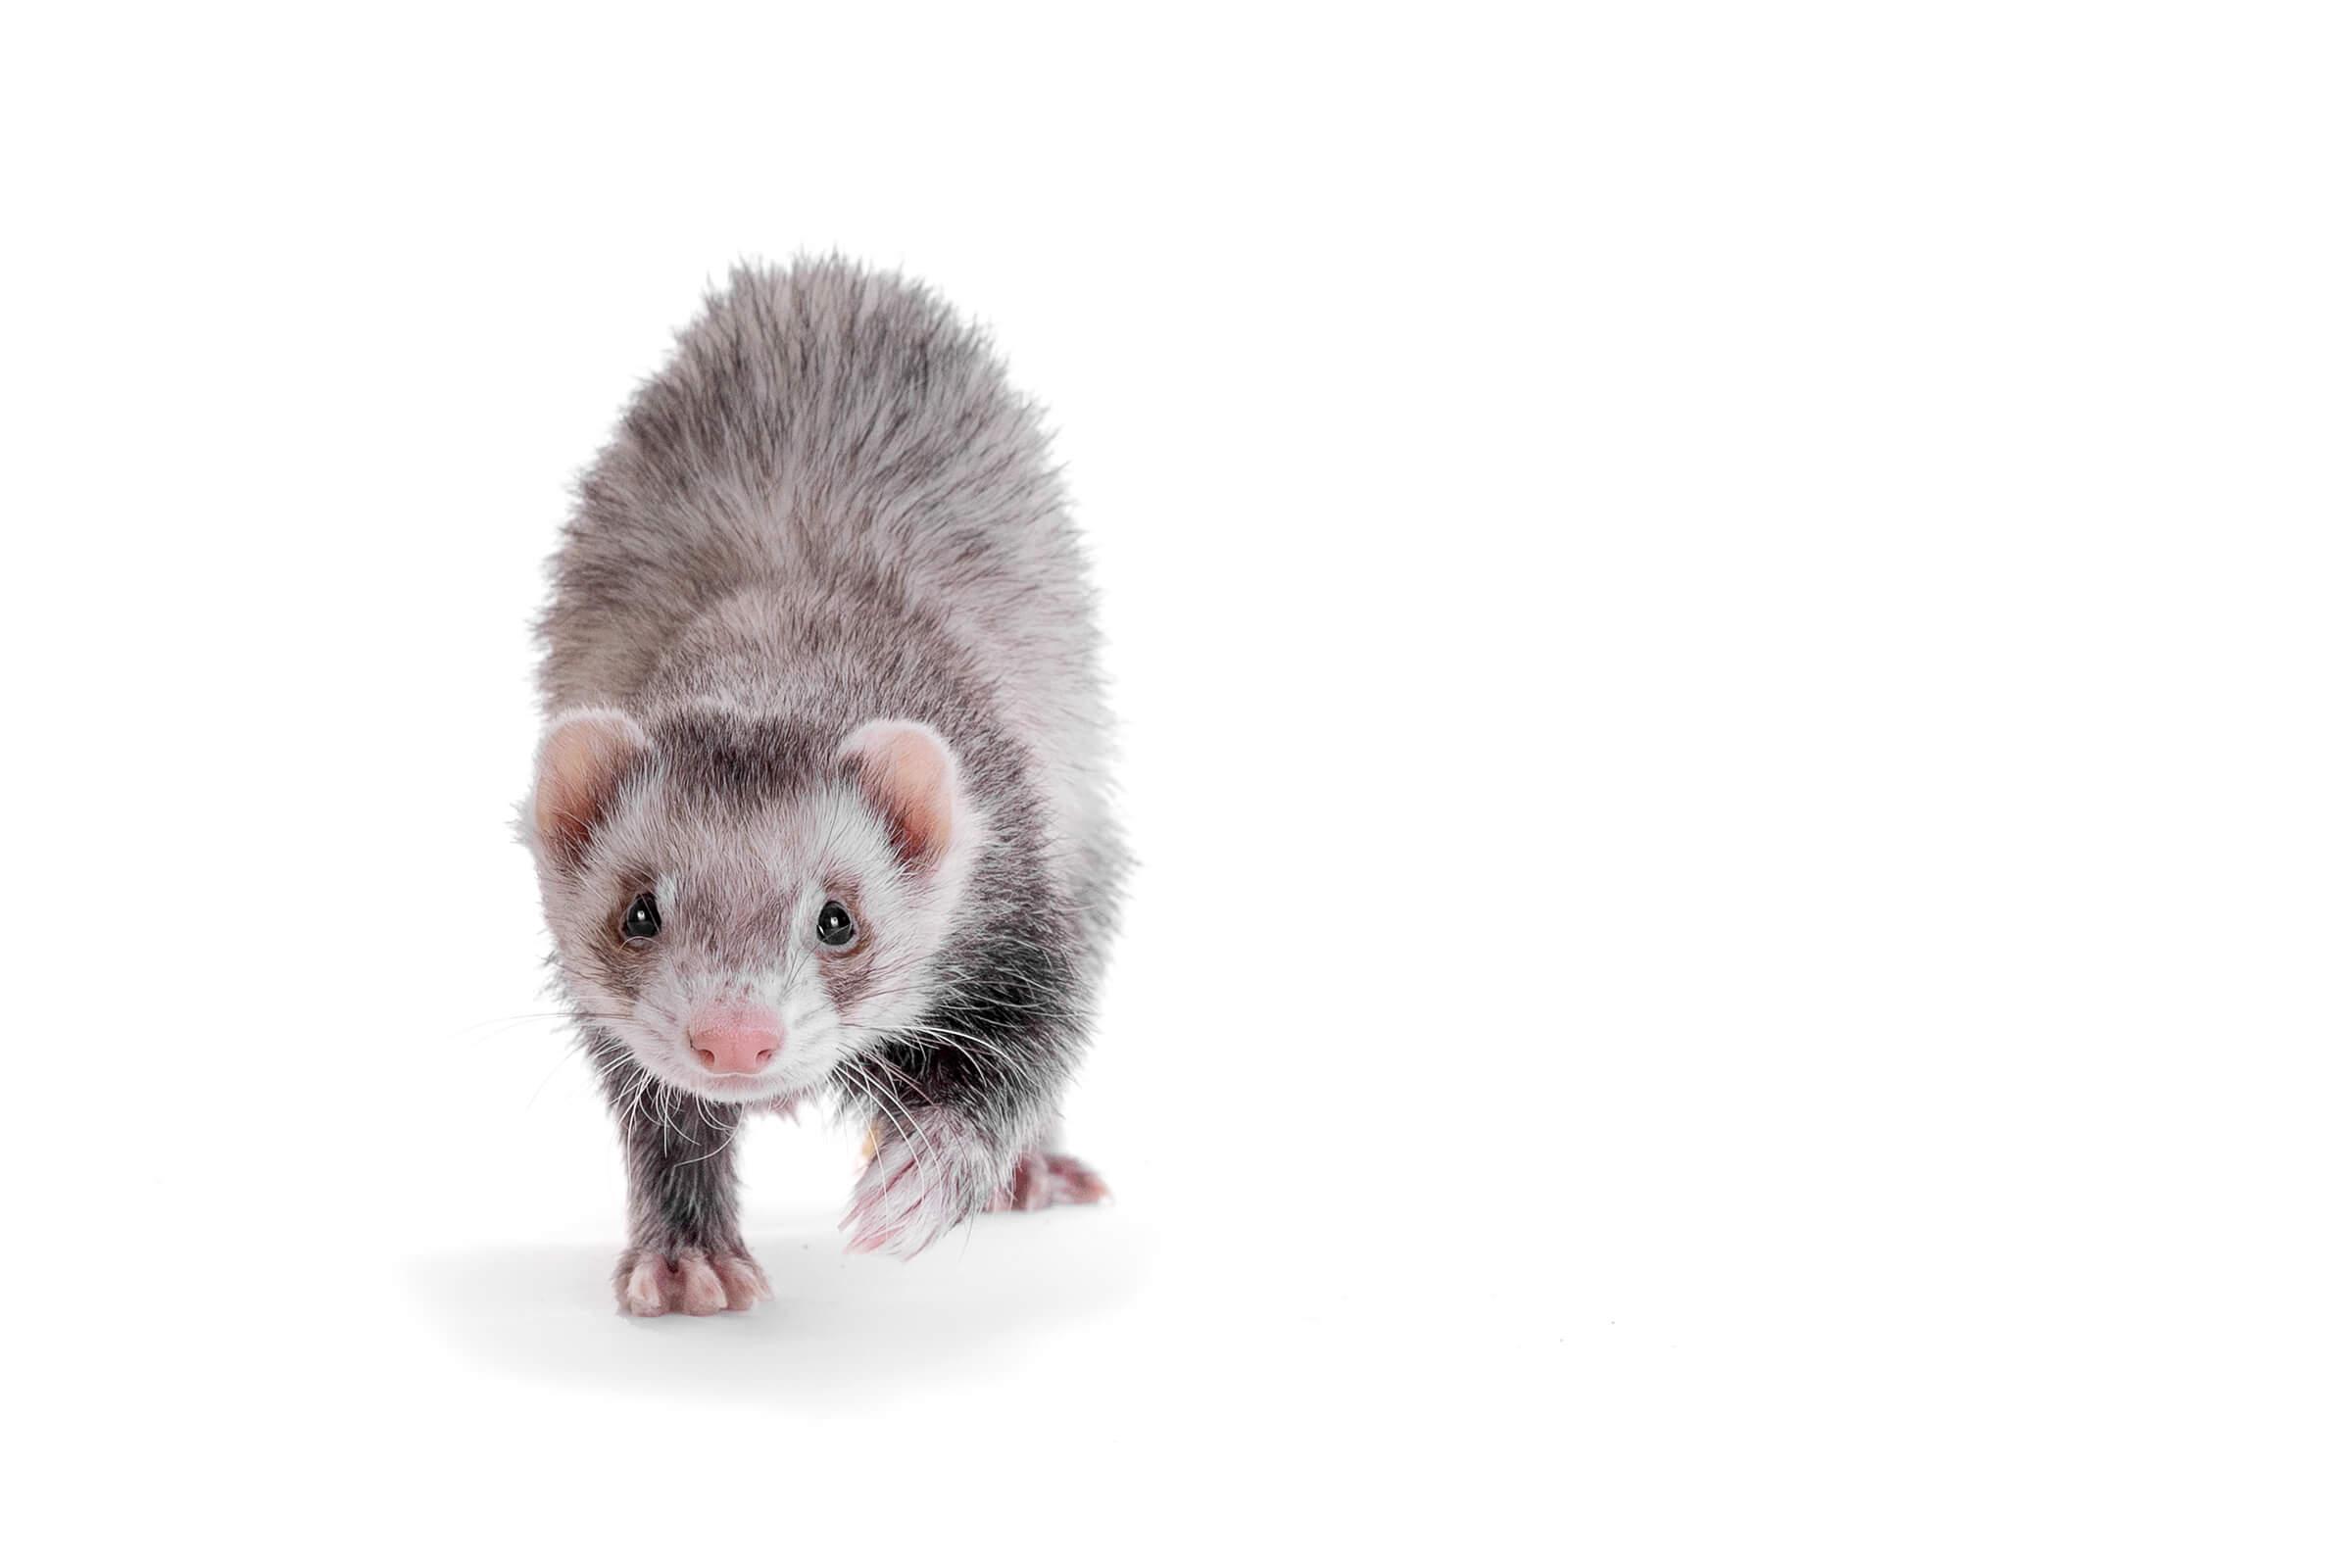 walking ferret on white background